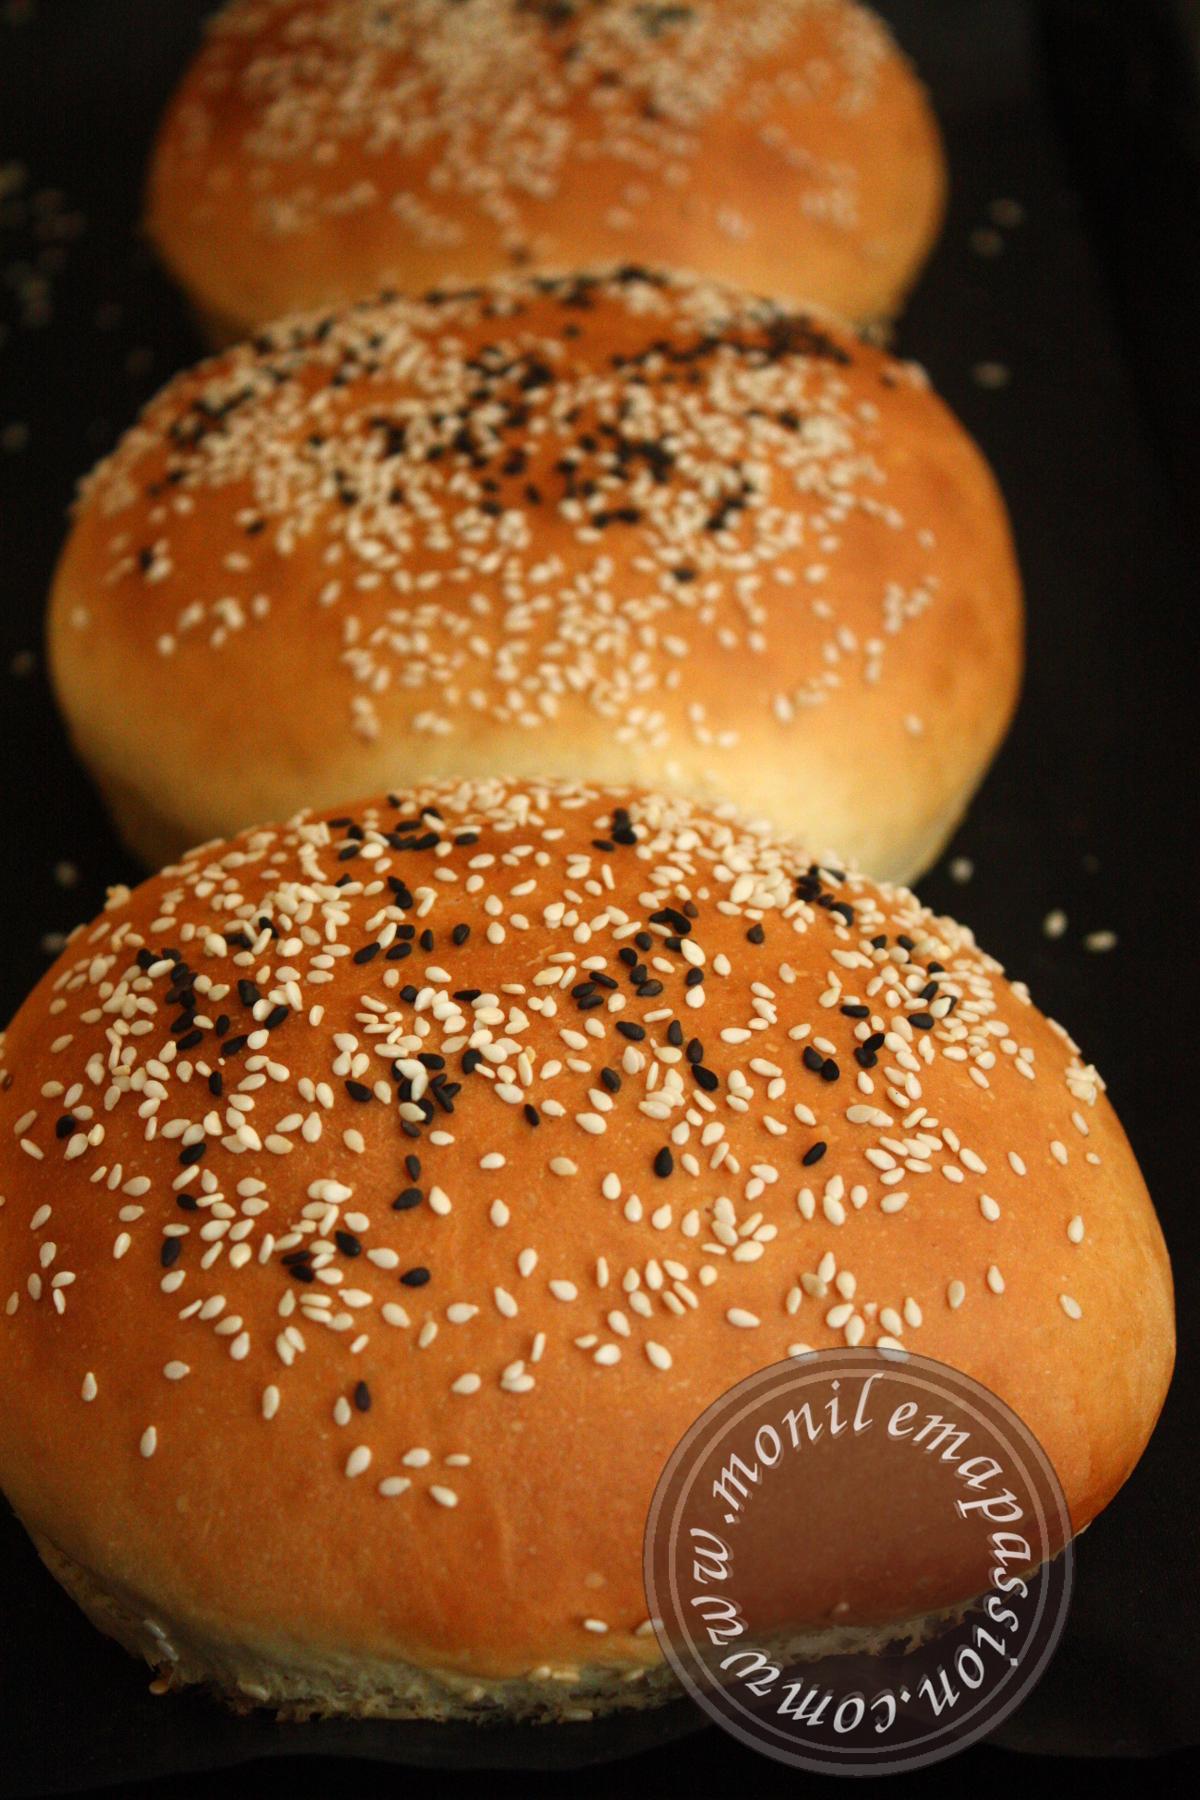 Pains à burger maison – Homemade burger buns